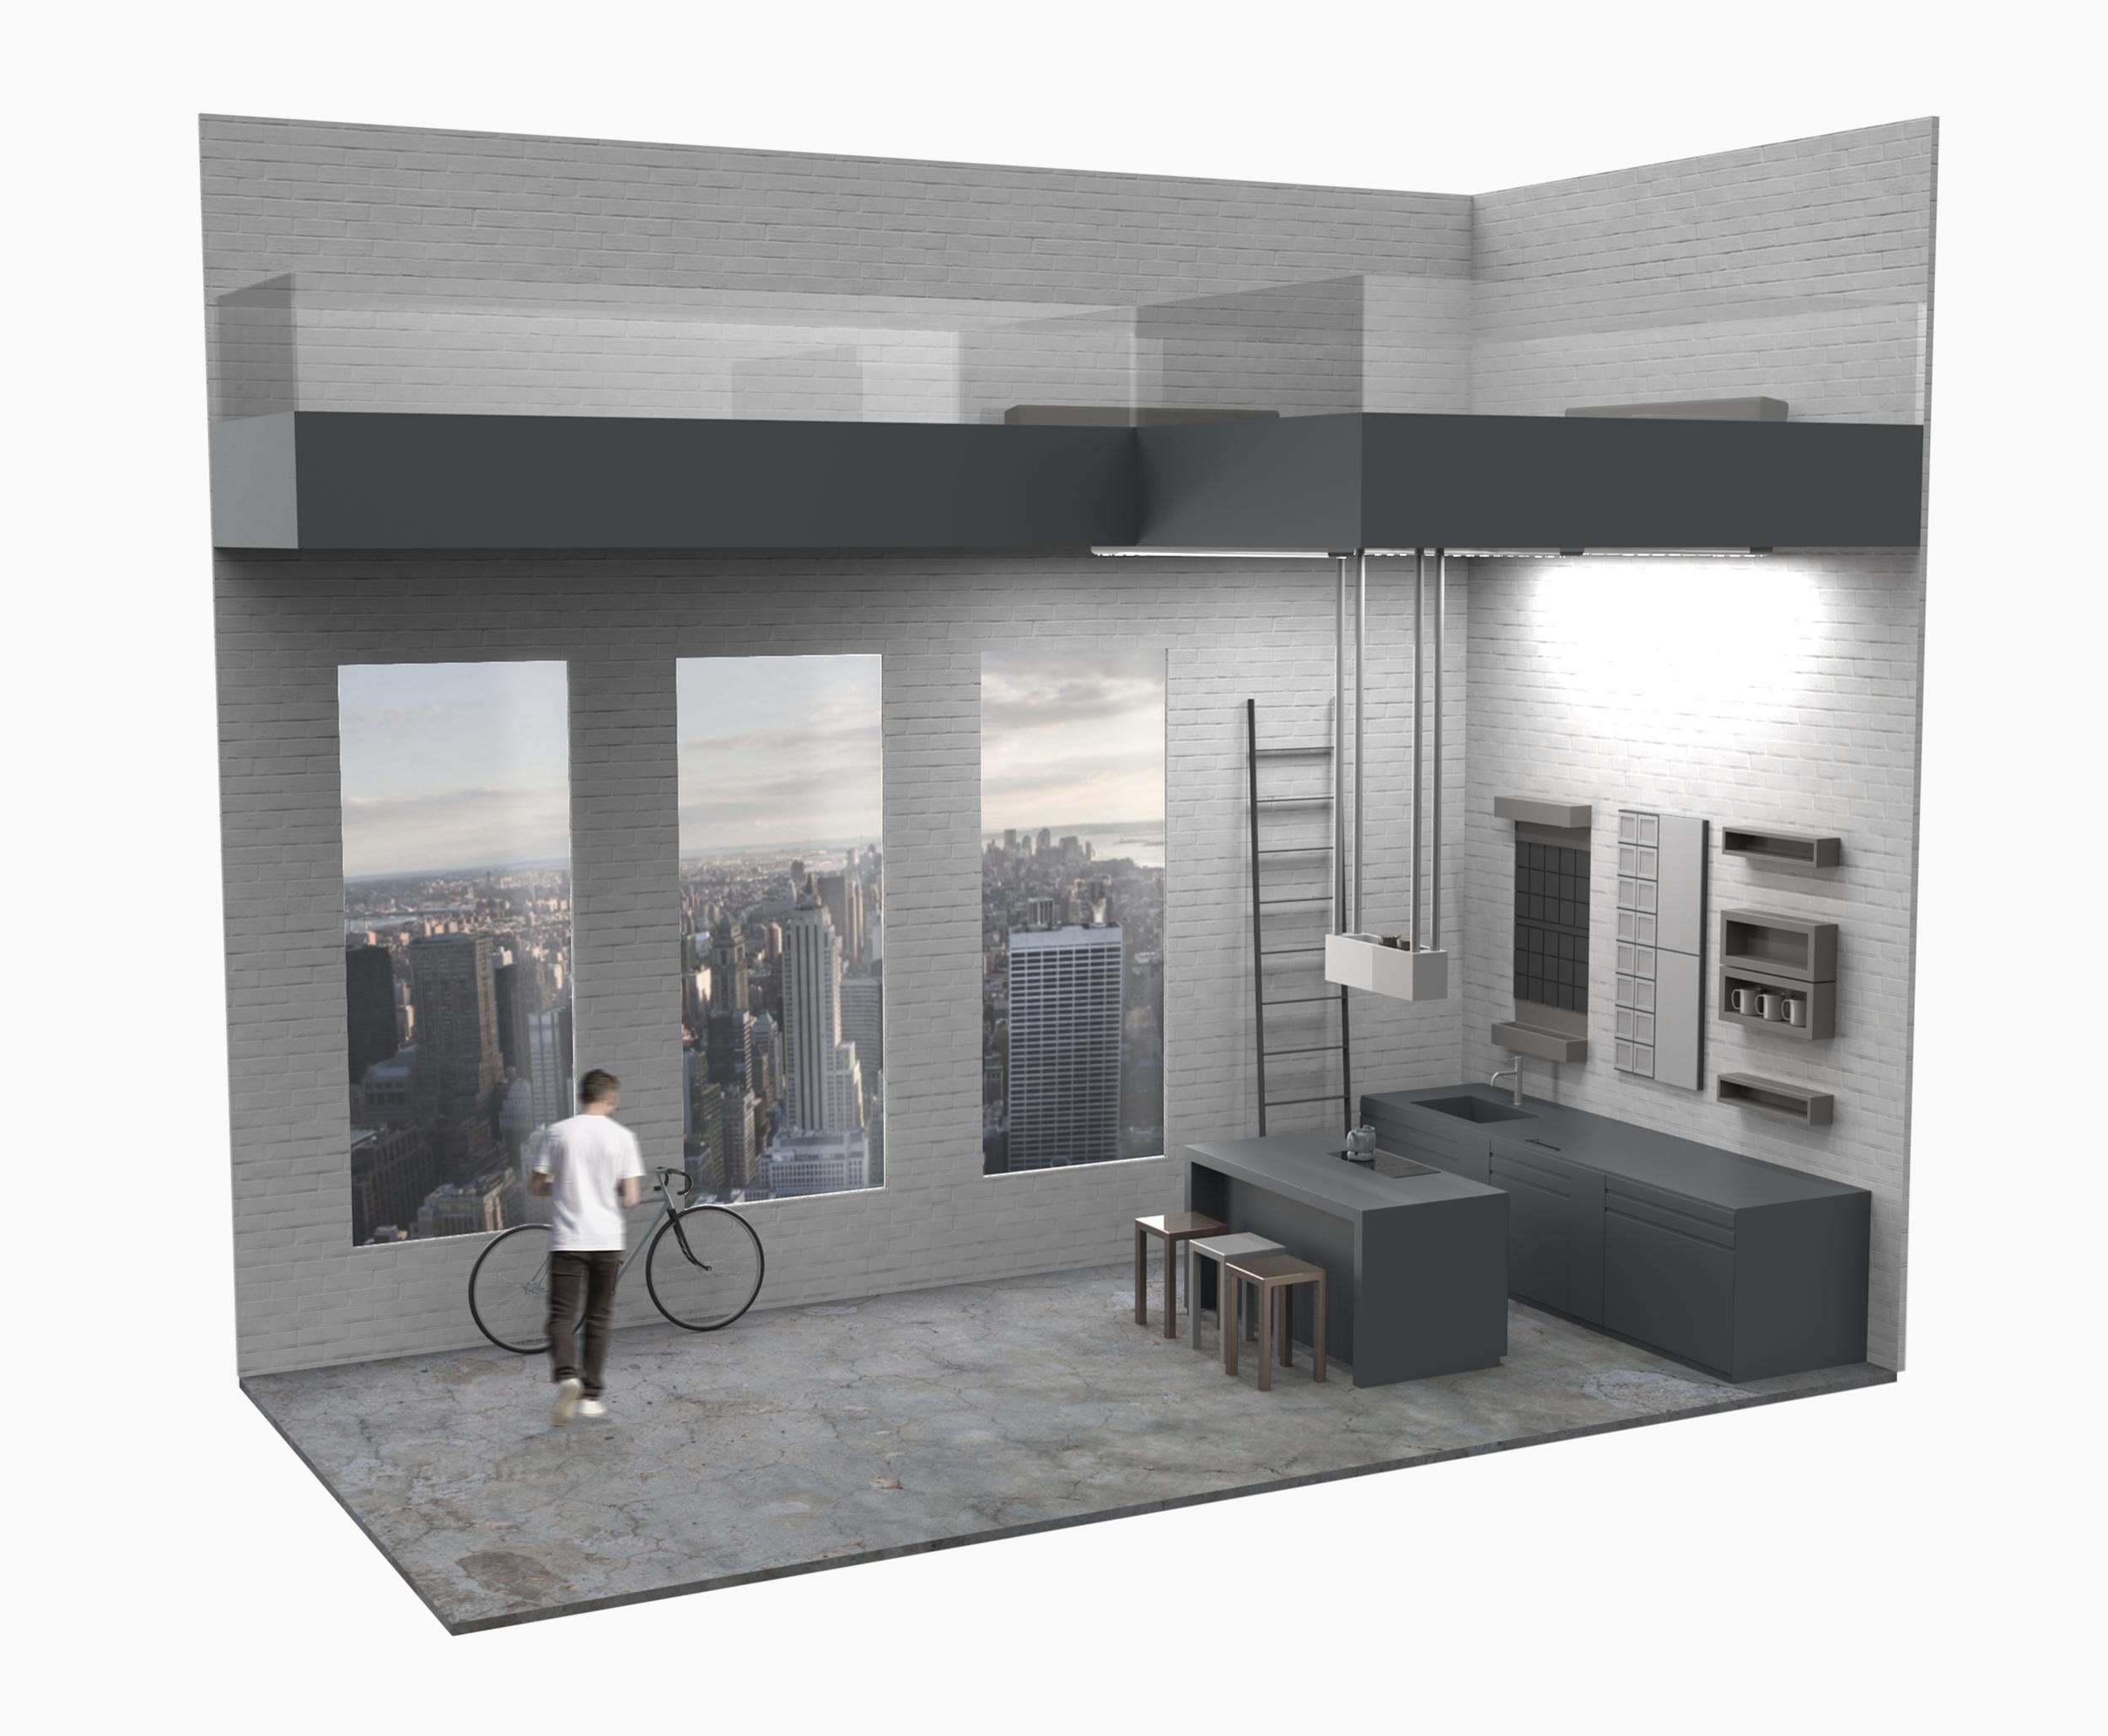 open loft (21 ft x 20 ft)